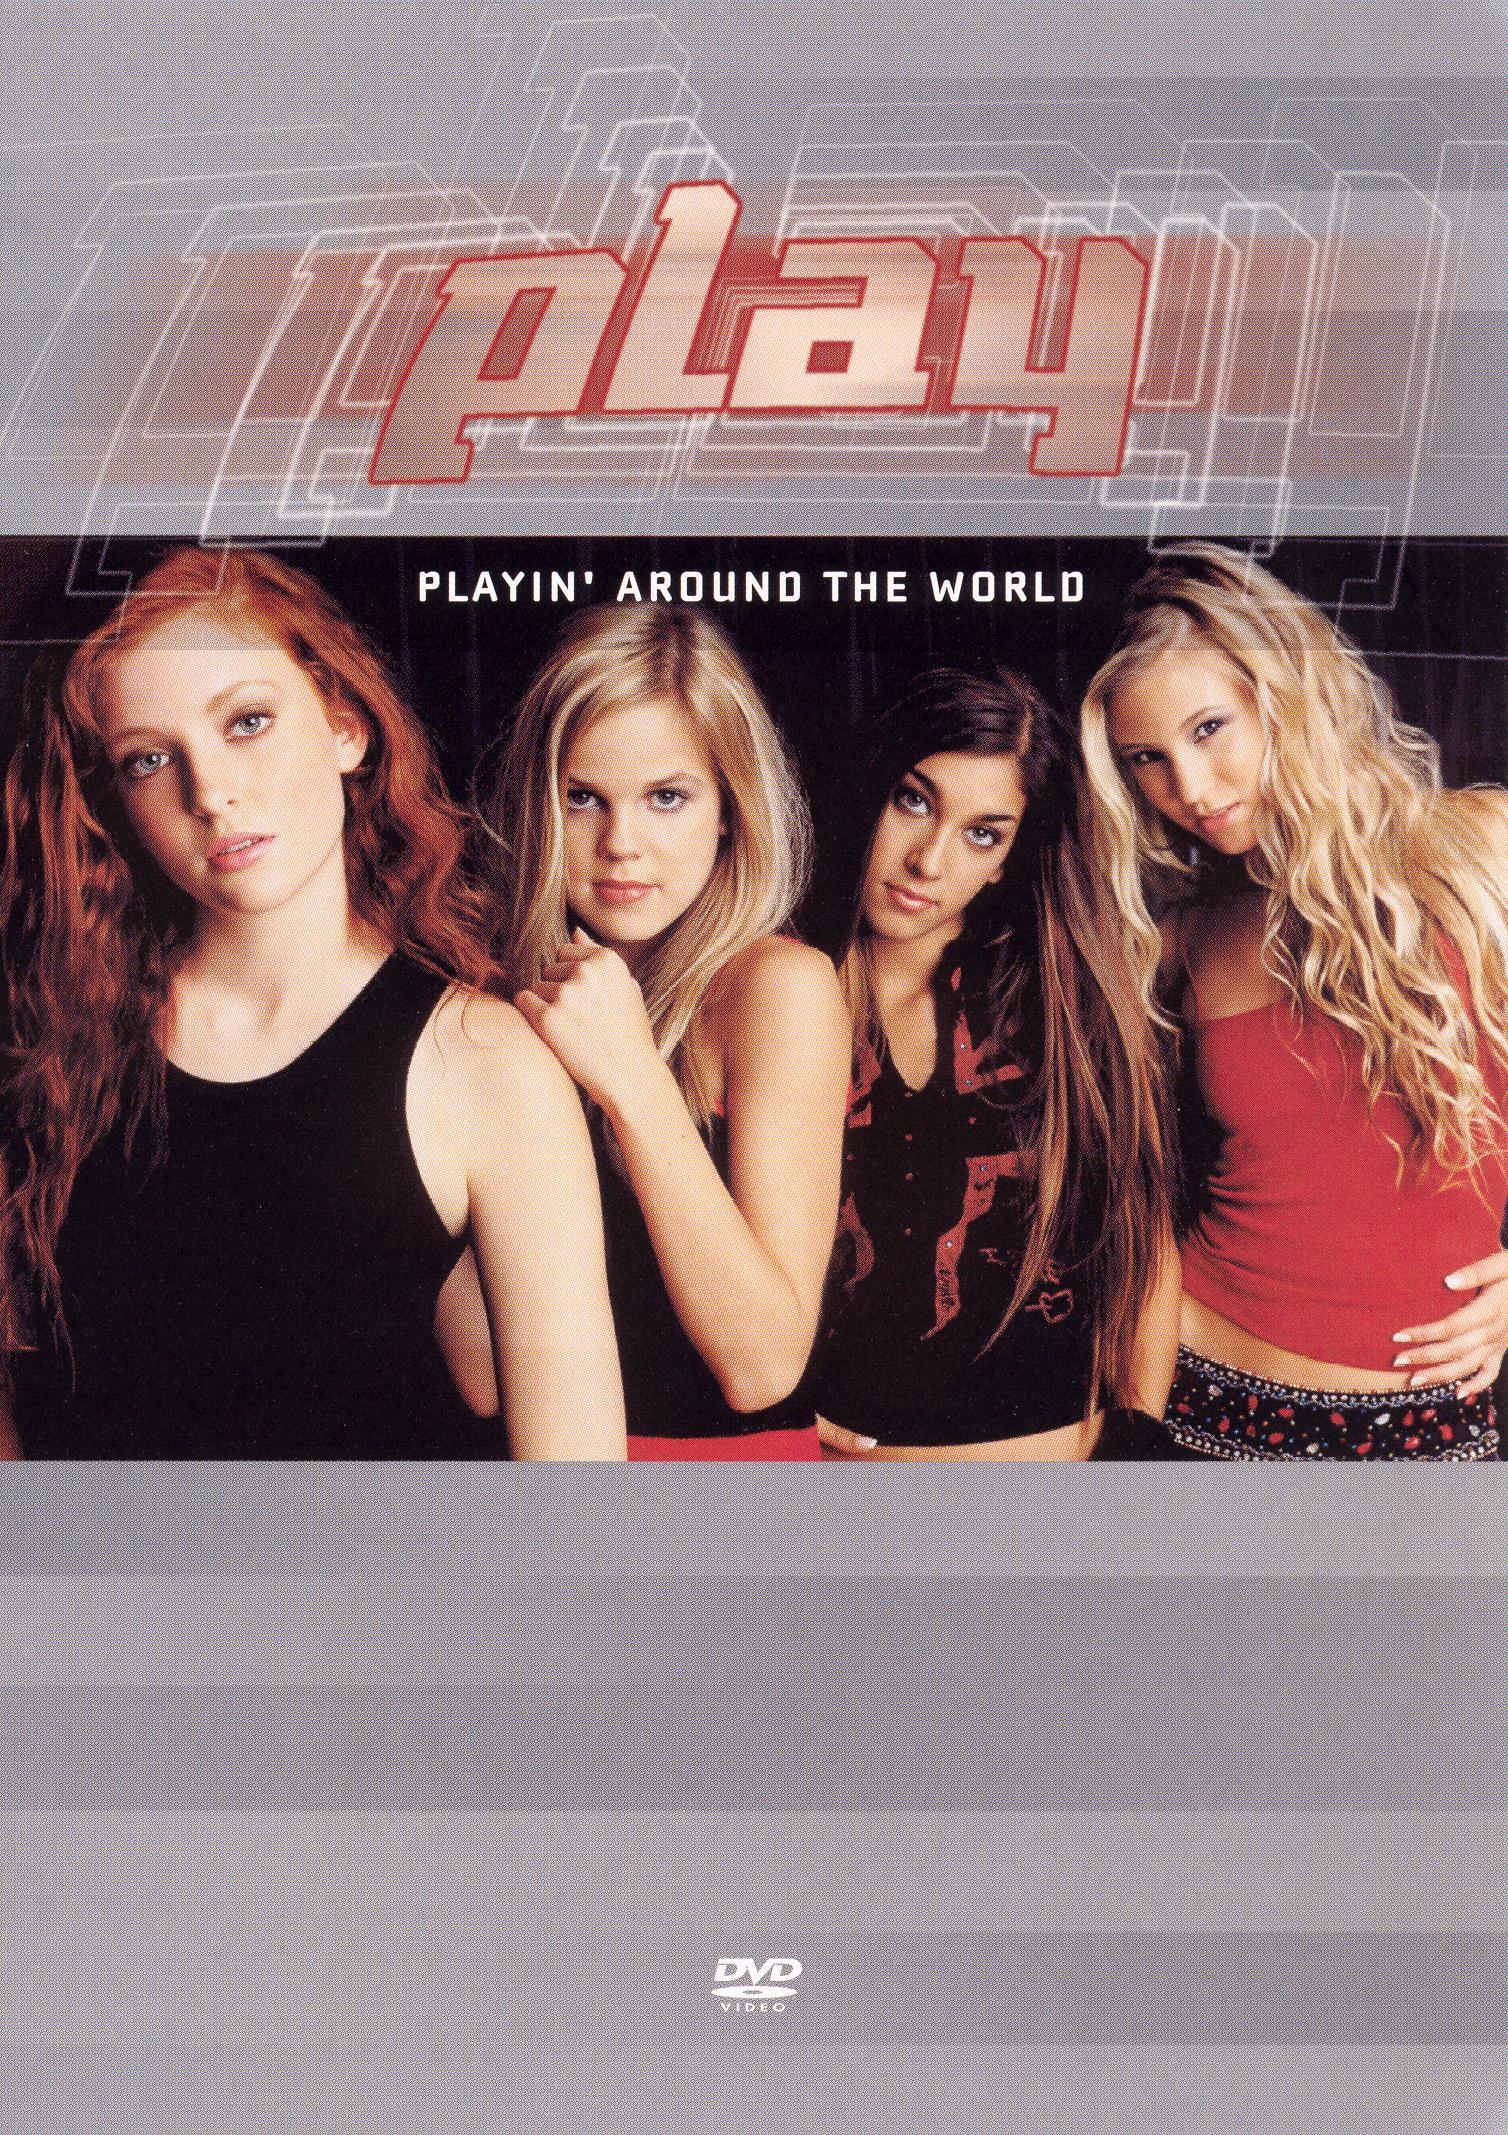 Play: Playin' Around the World